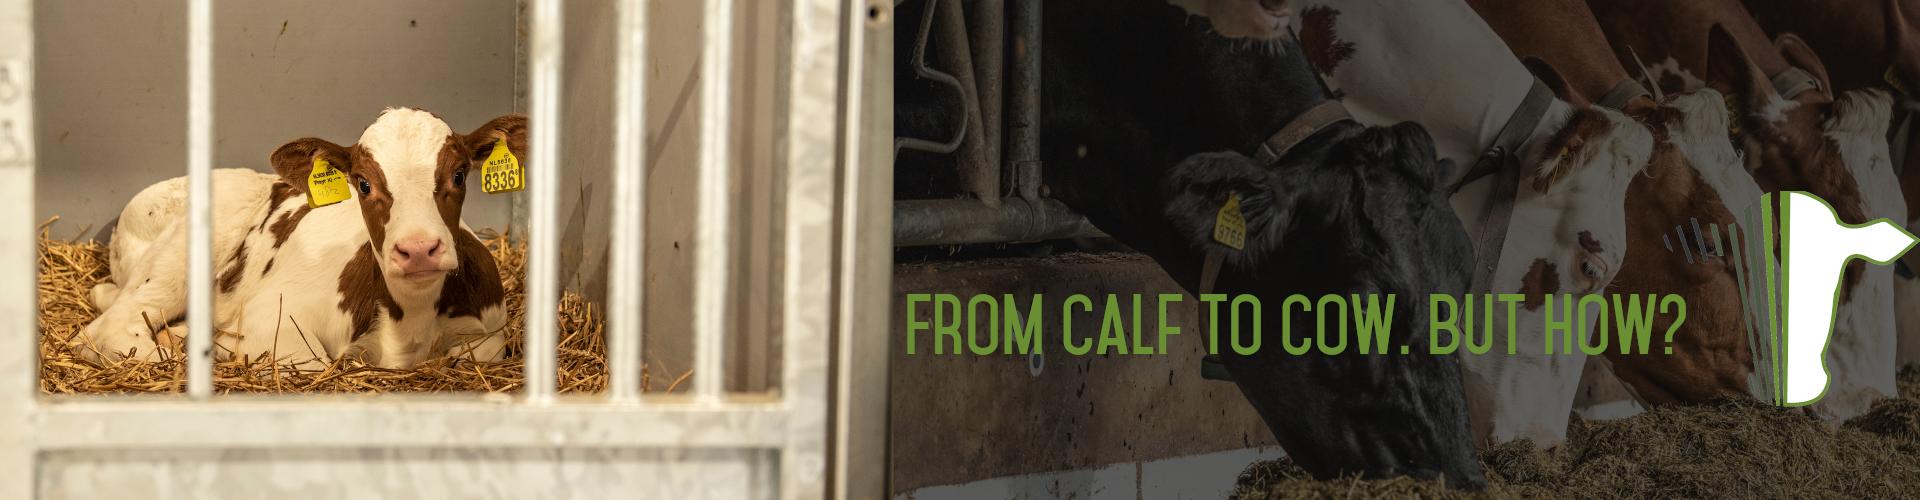 calf to cow